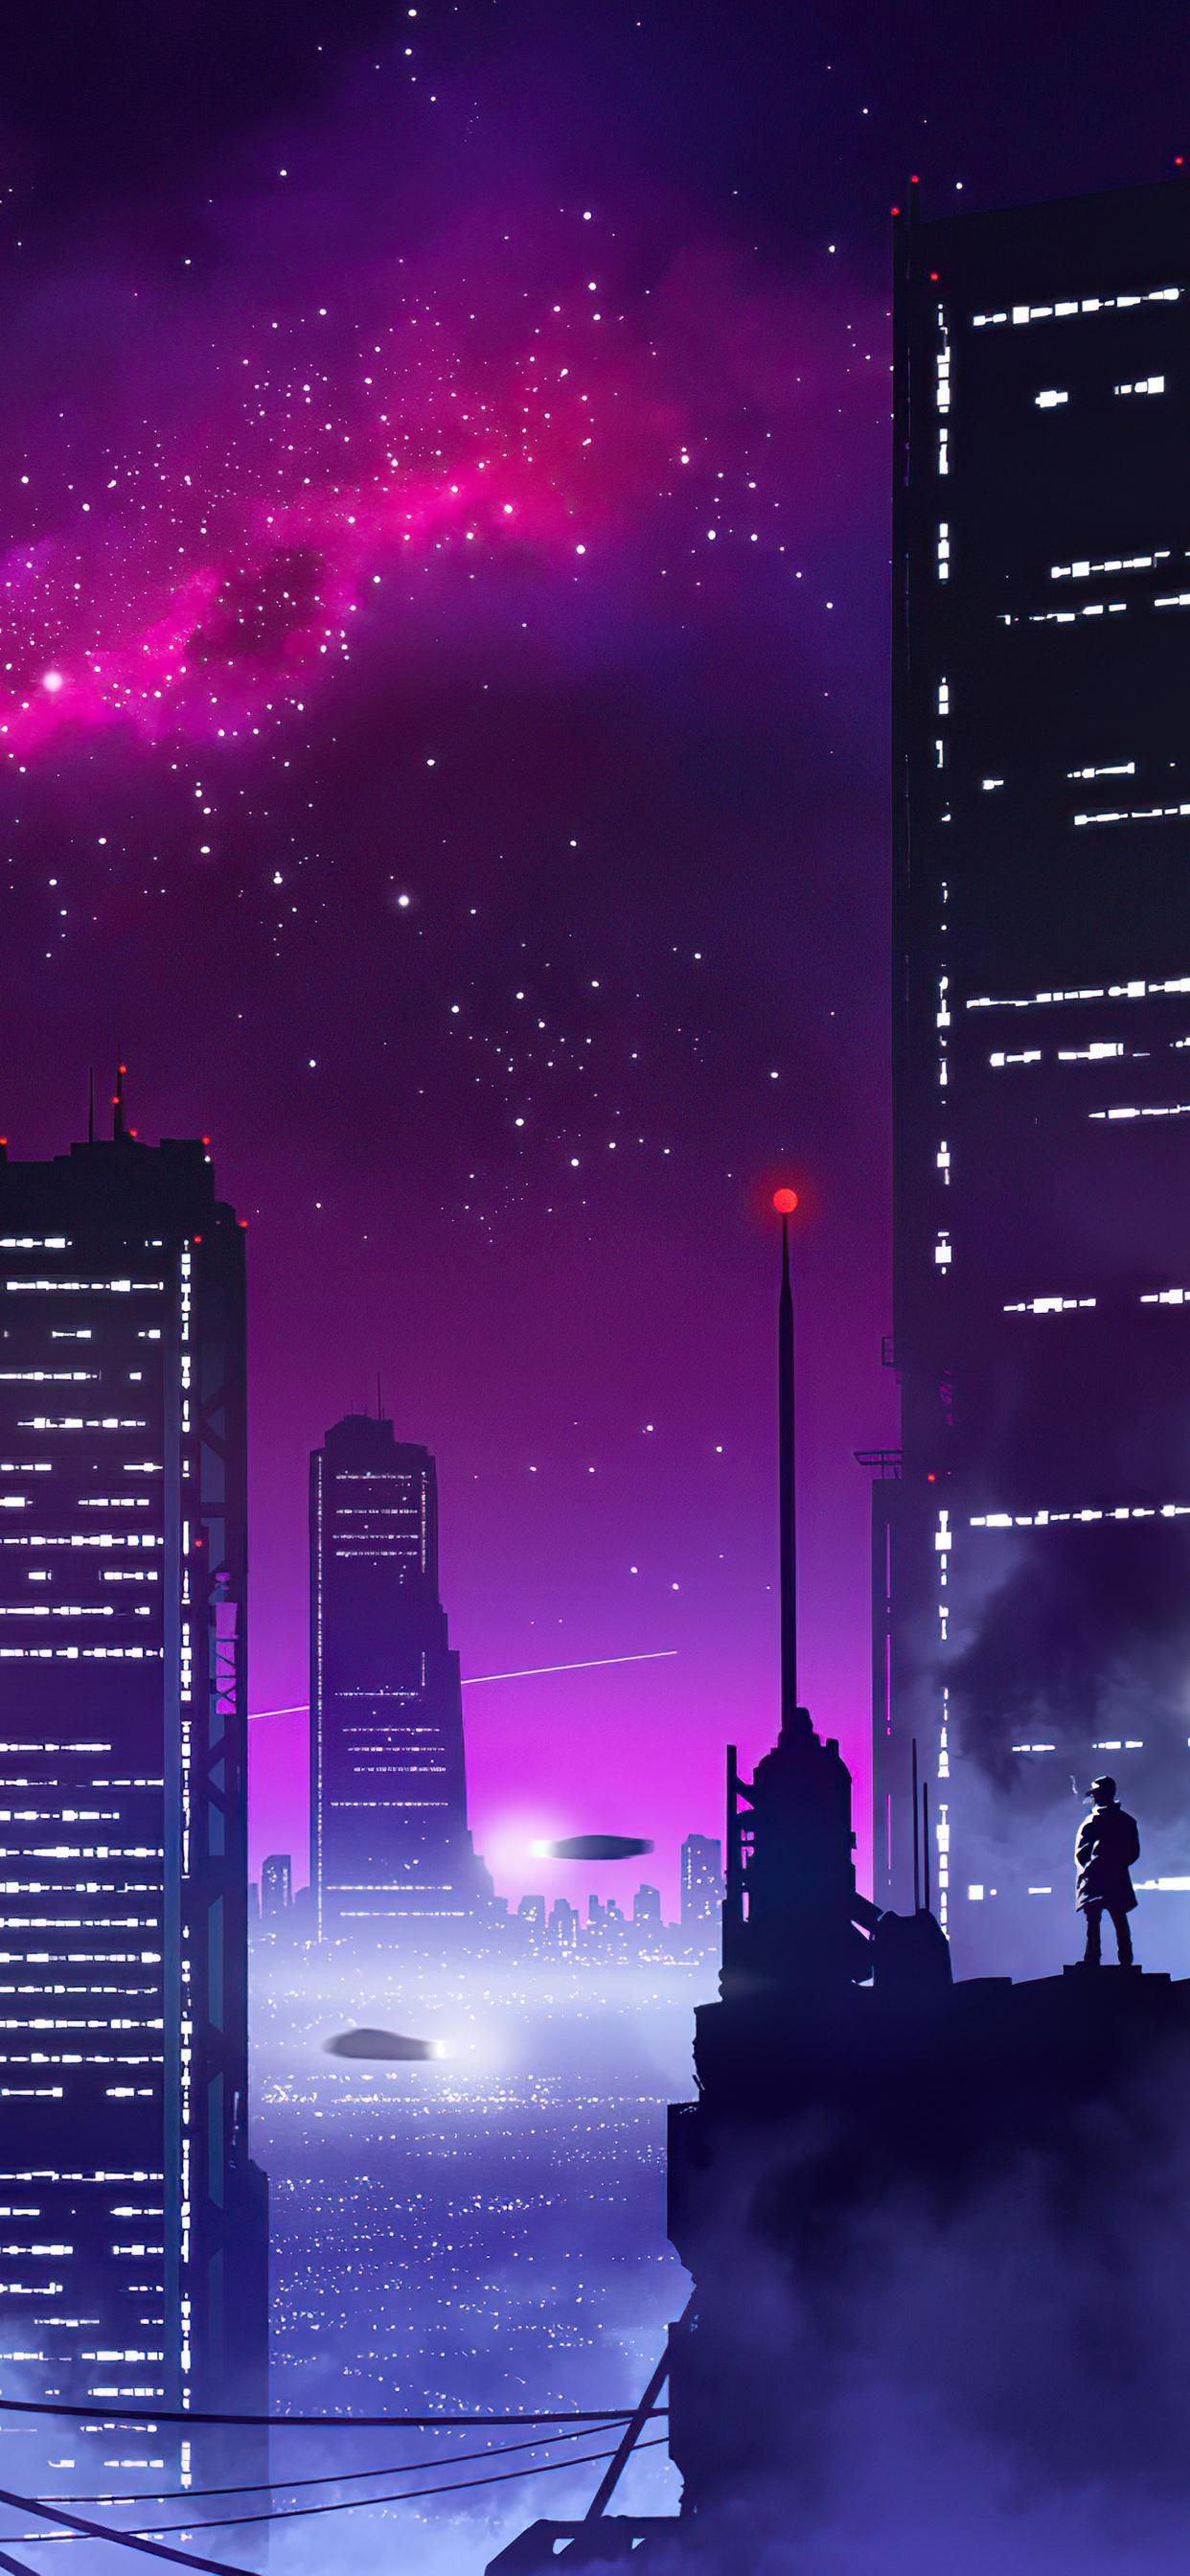 the-night-p6.jpg